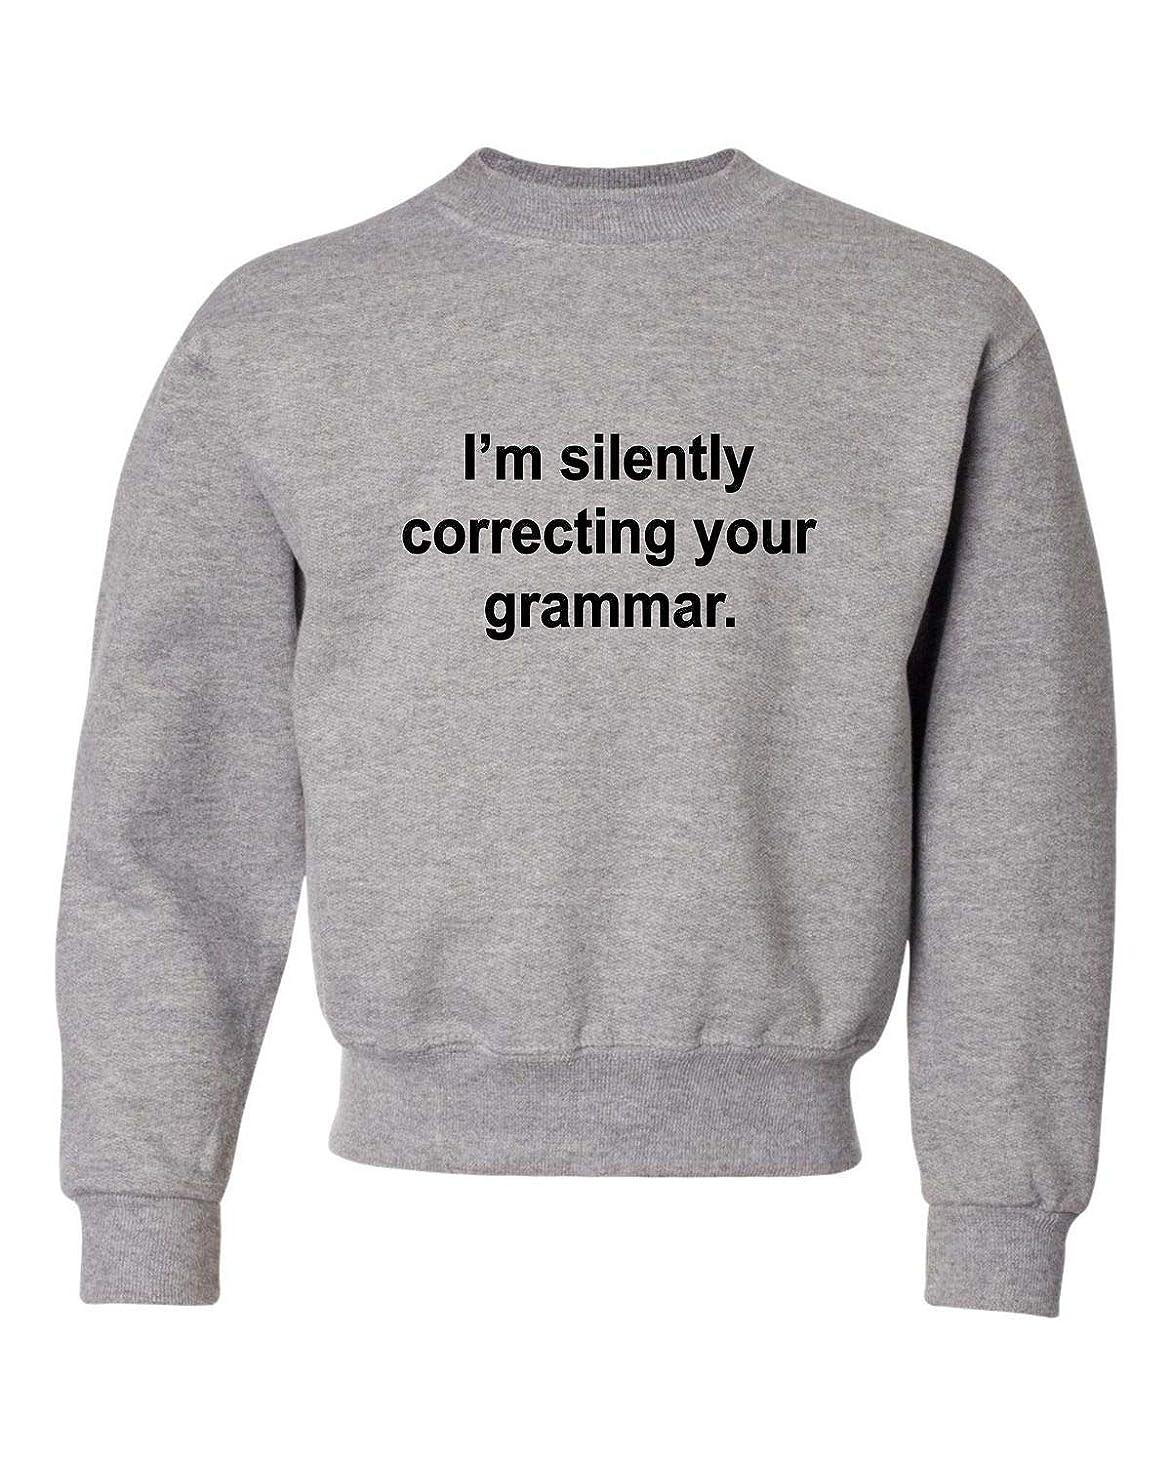 Go All Out Youth I'm Silently Correcting Your Grammar English Major Crewneck Sweatshirt